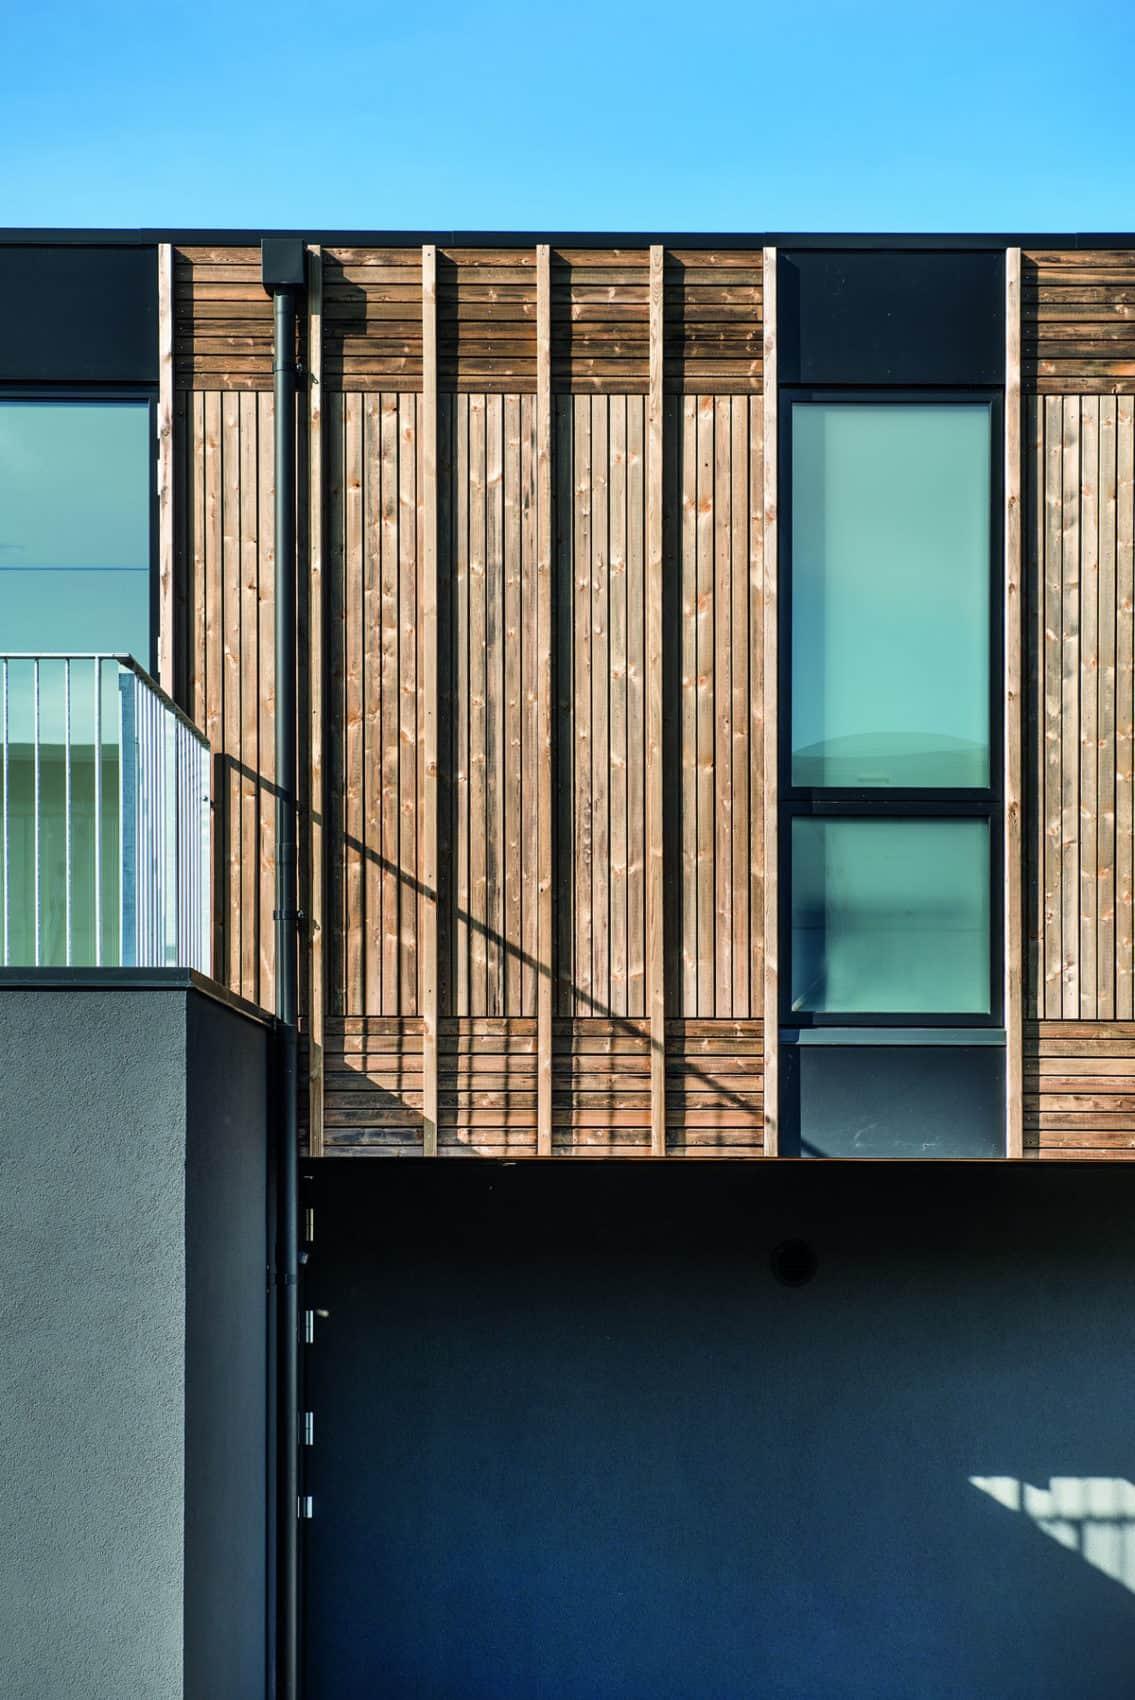 The Adaptable House by Henning Larsen & Realdania (6)